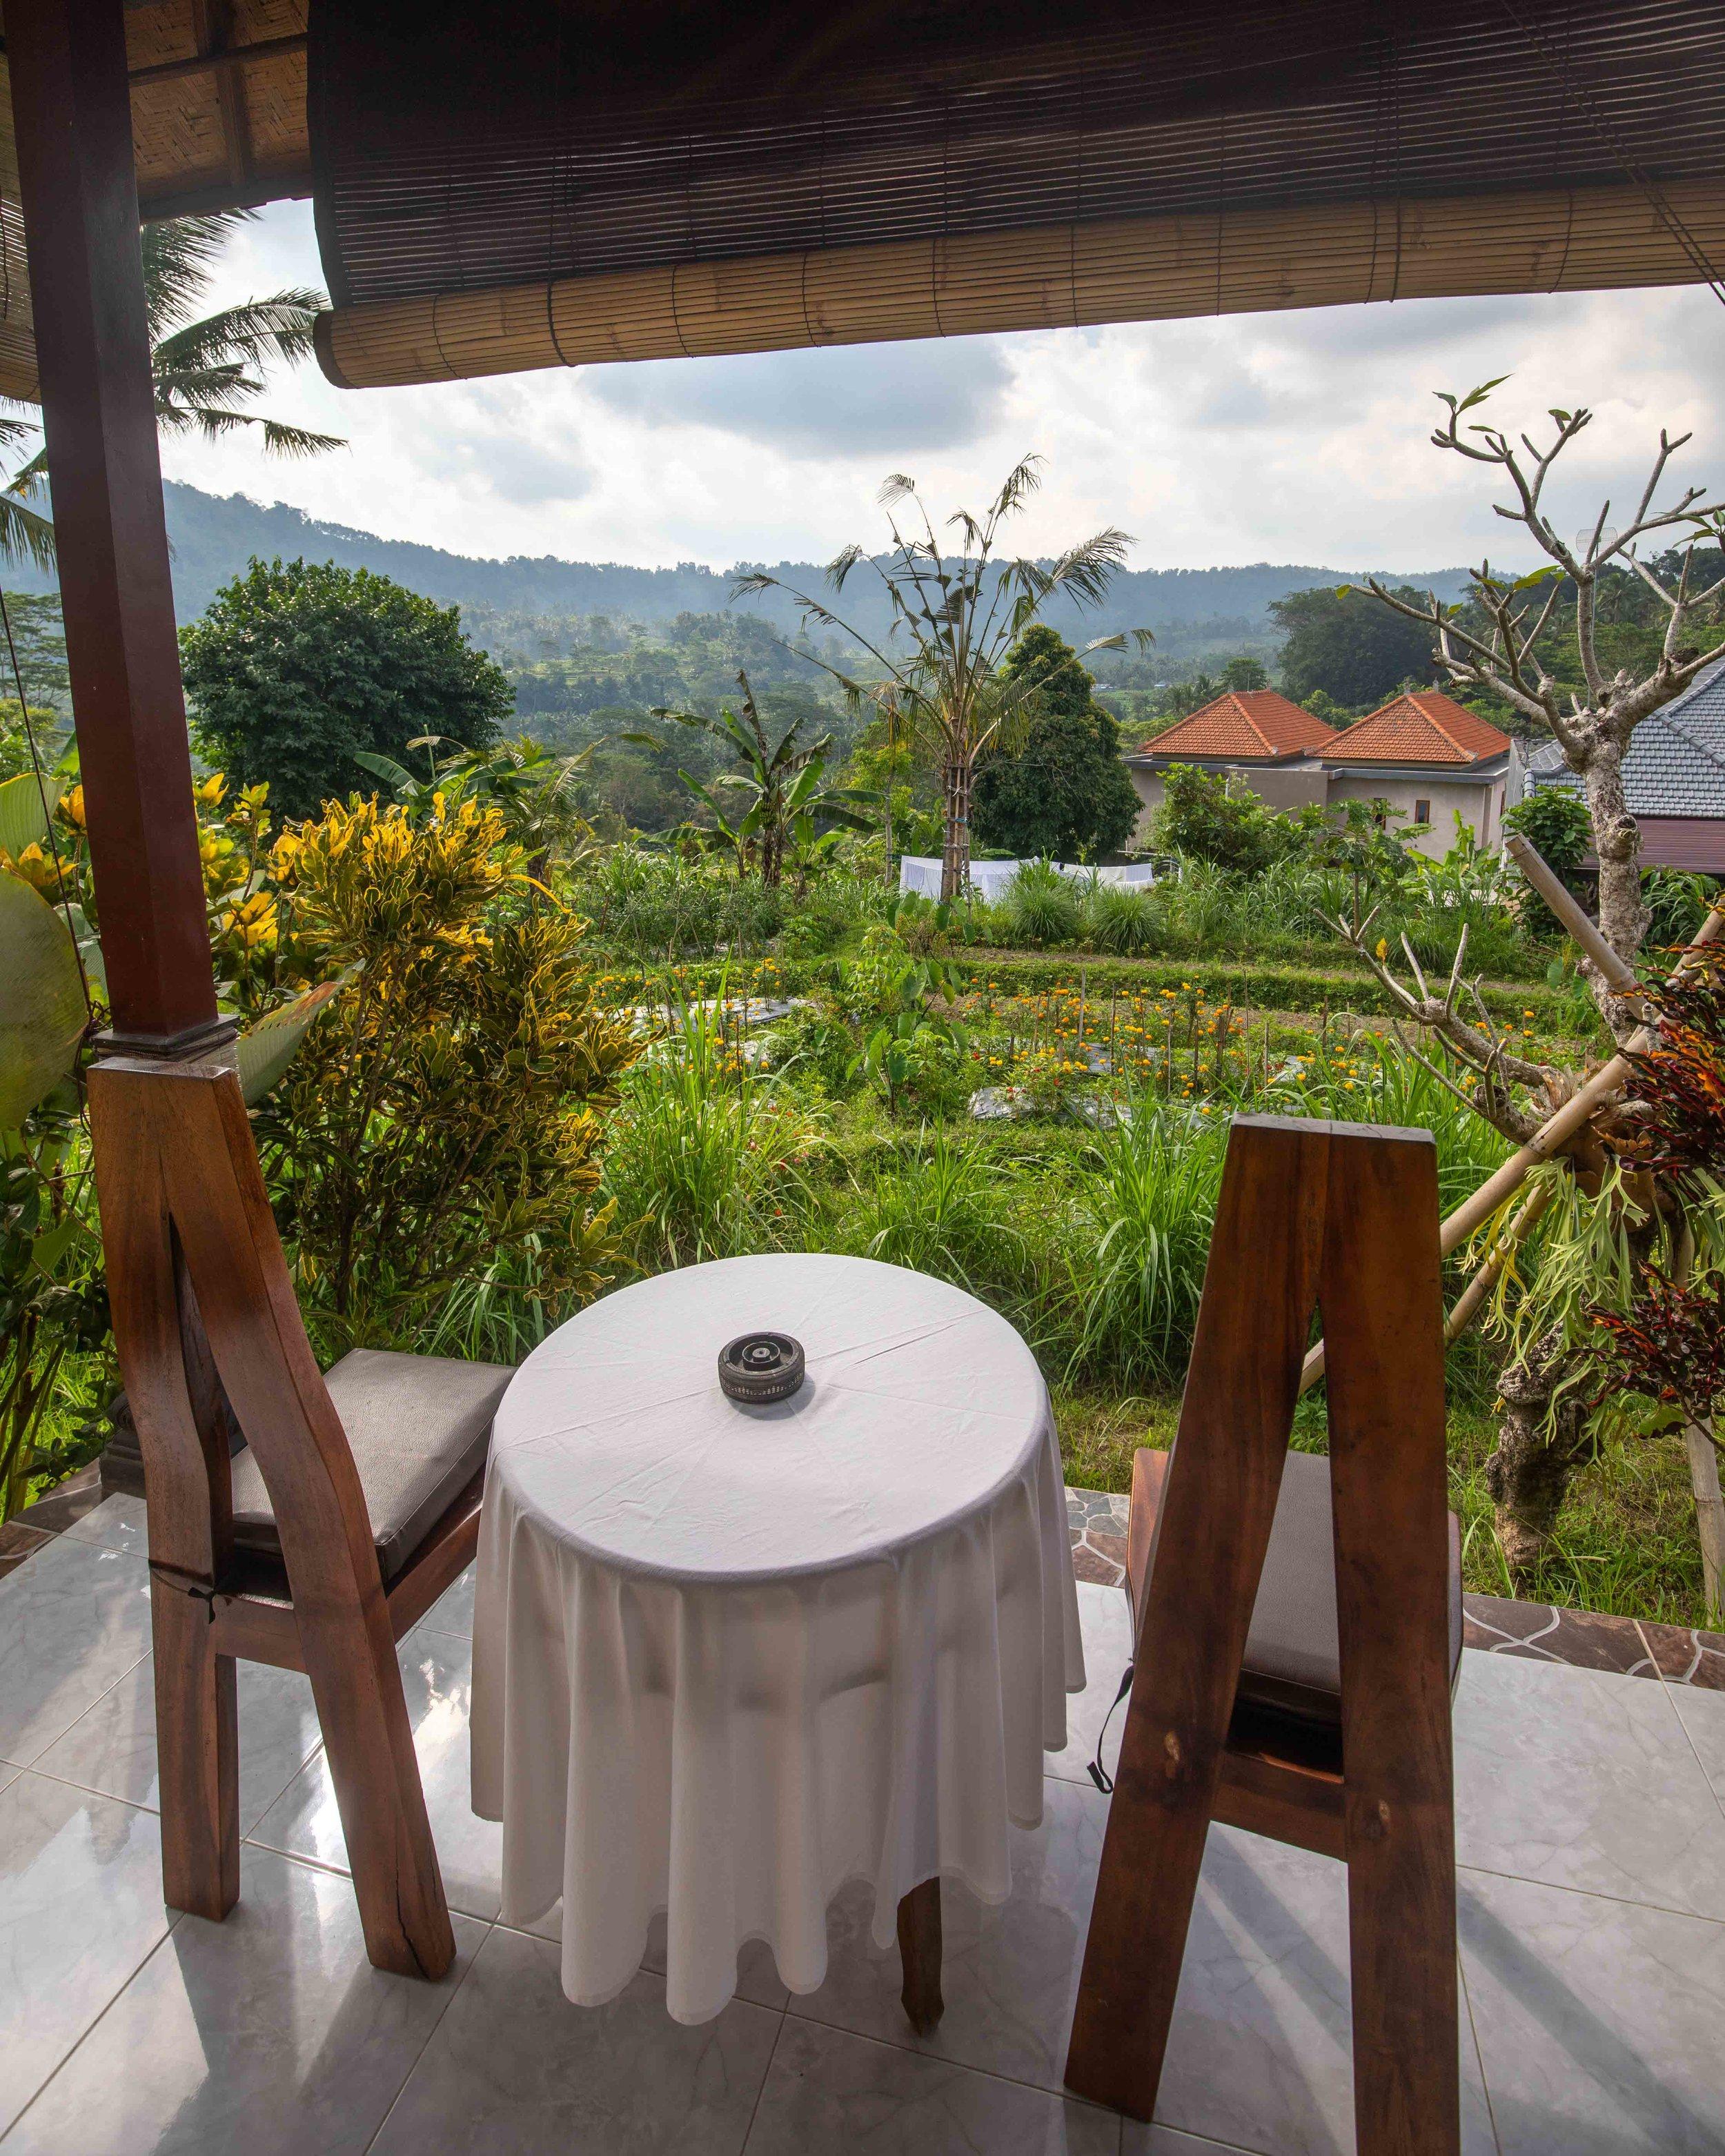 The view from Maha Neka Homestay, Sidemen Bali